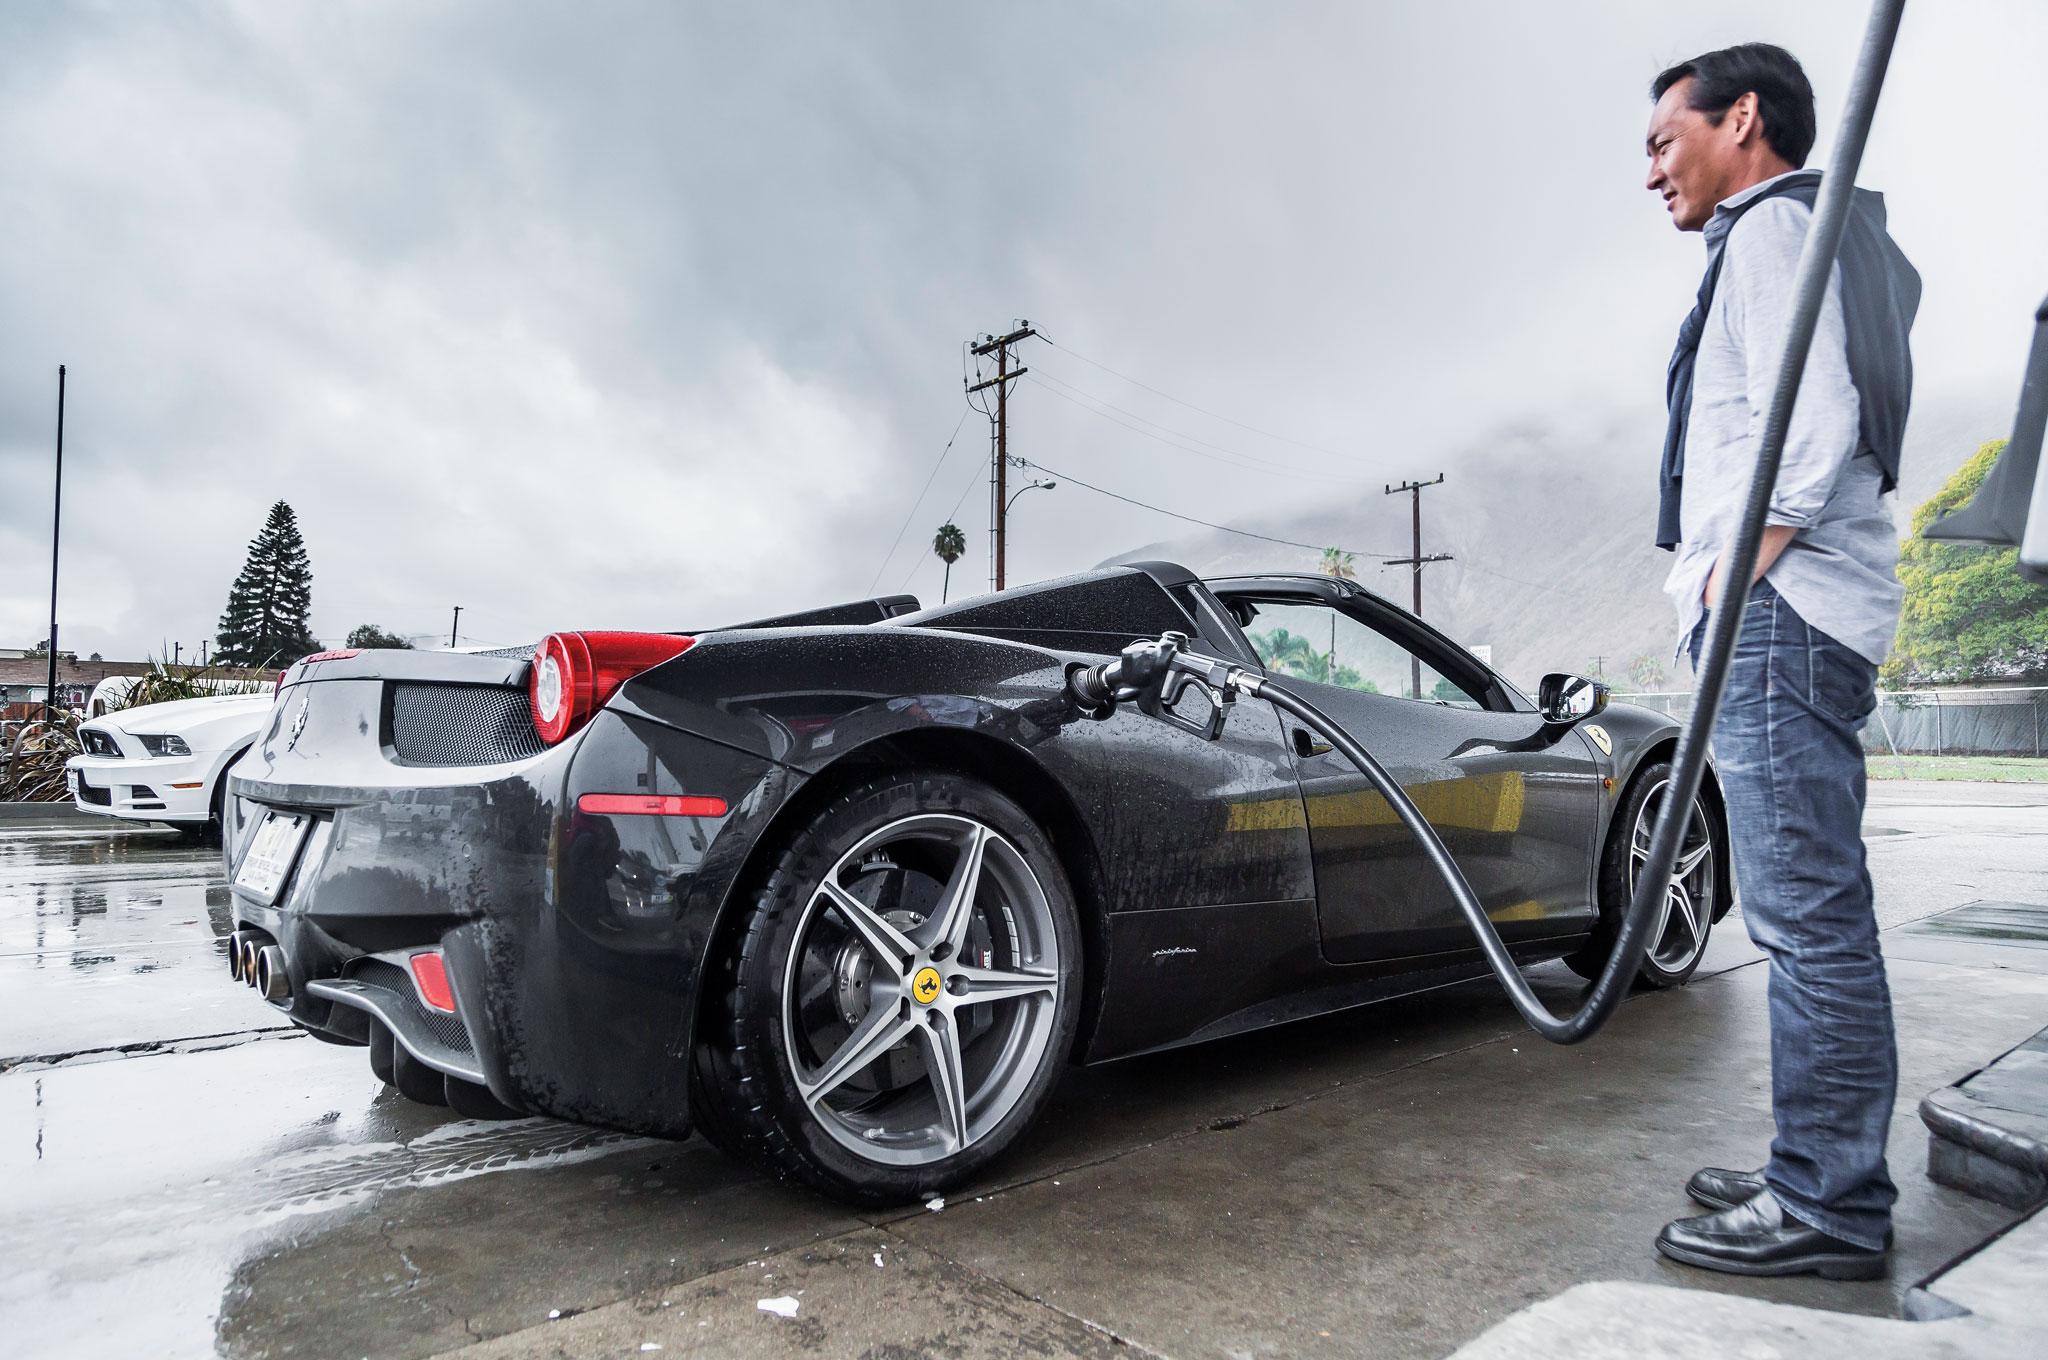 Ferrari daily driver